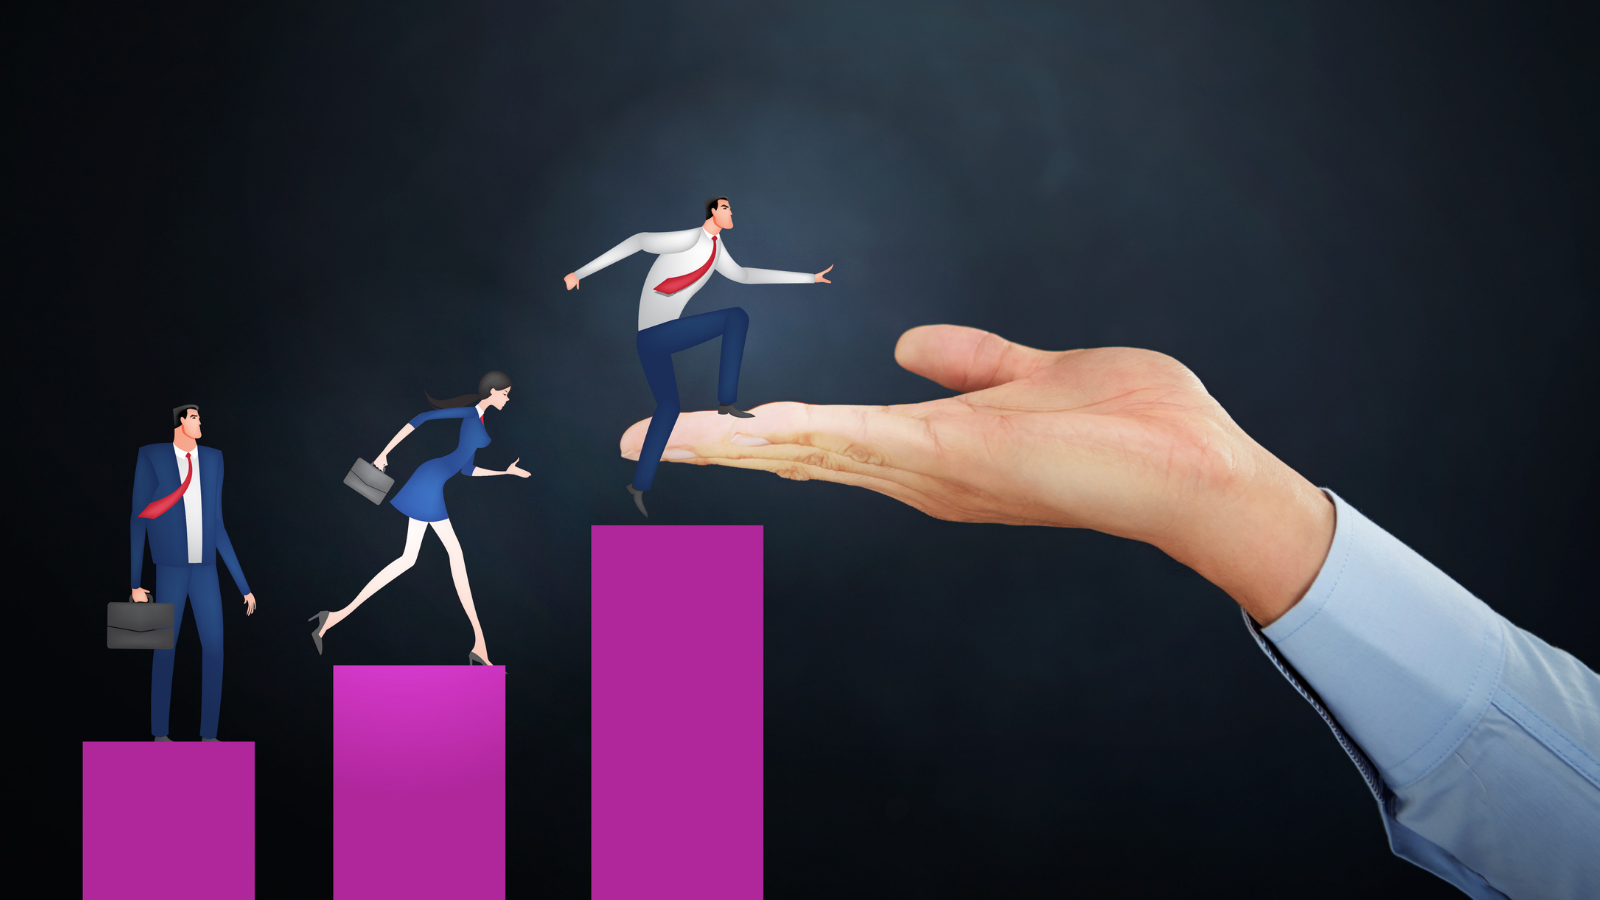 Benefits of mentoring on career development